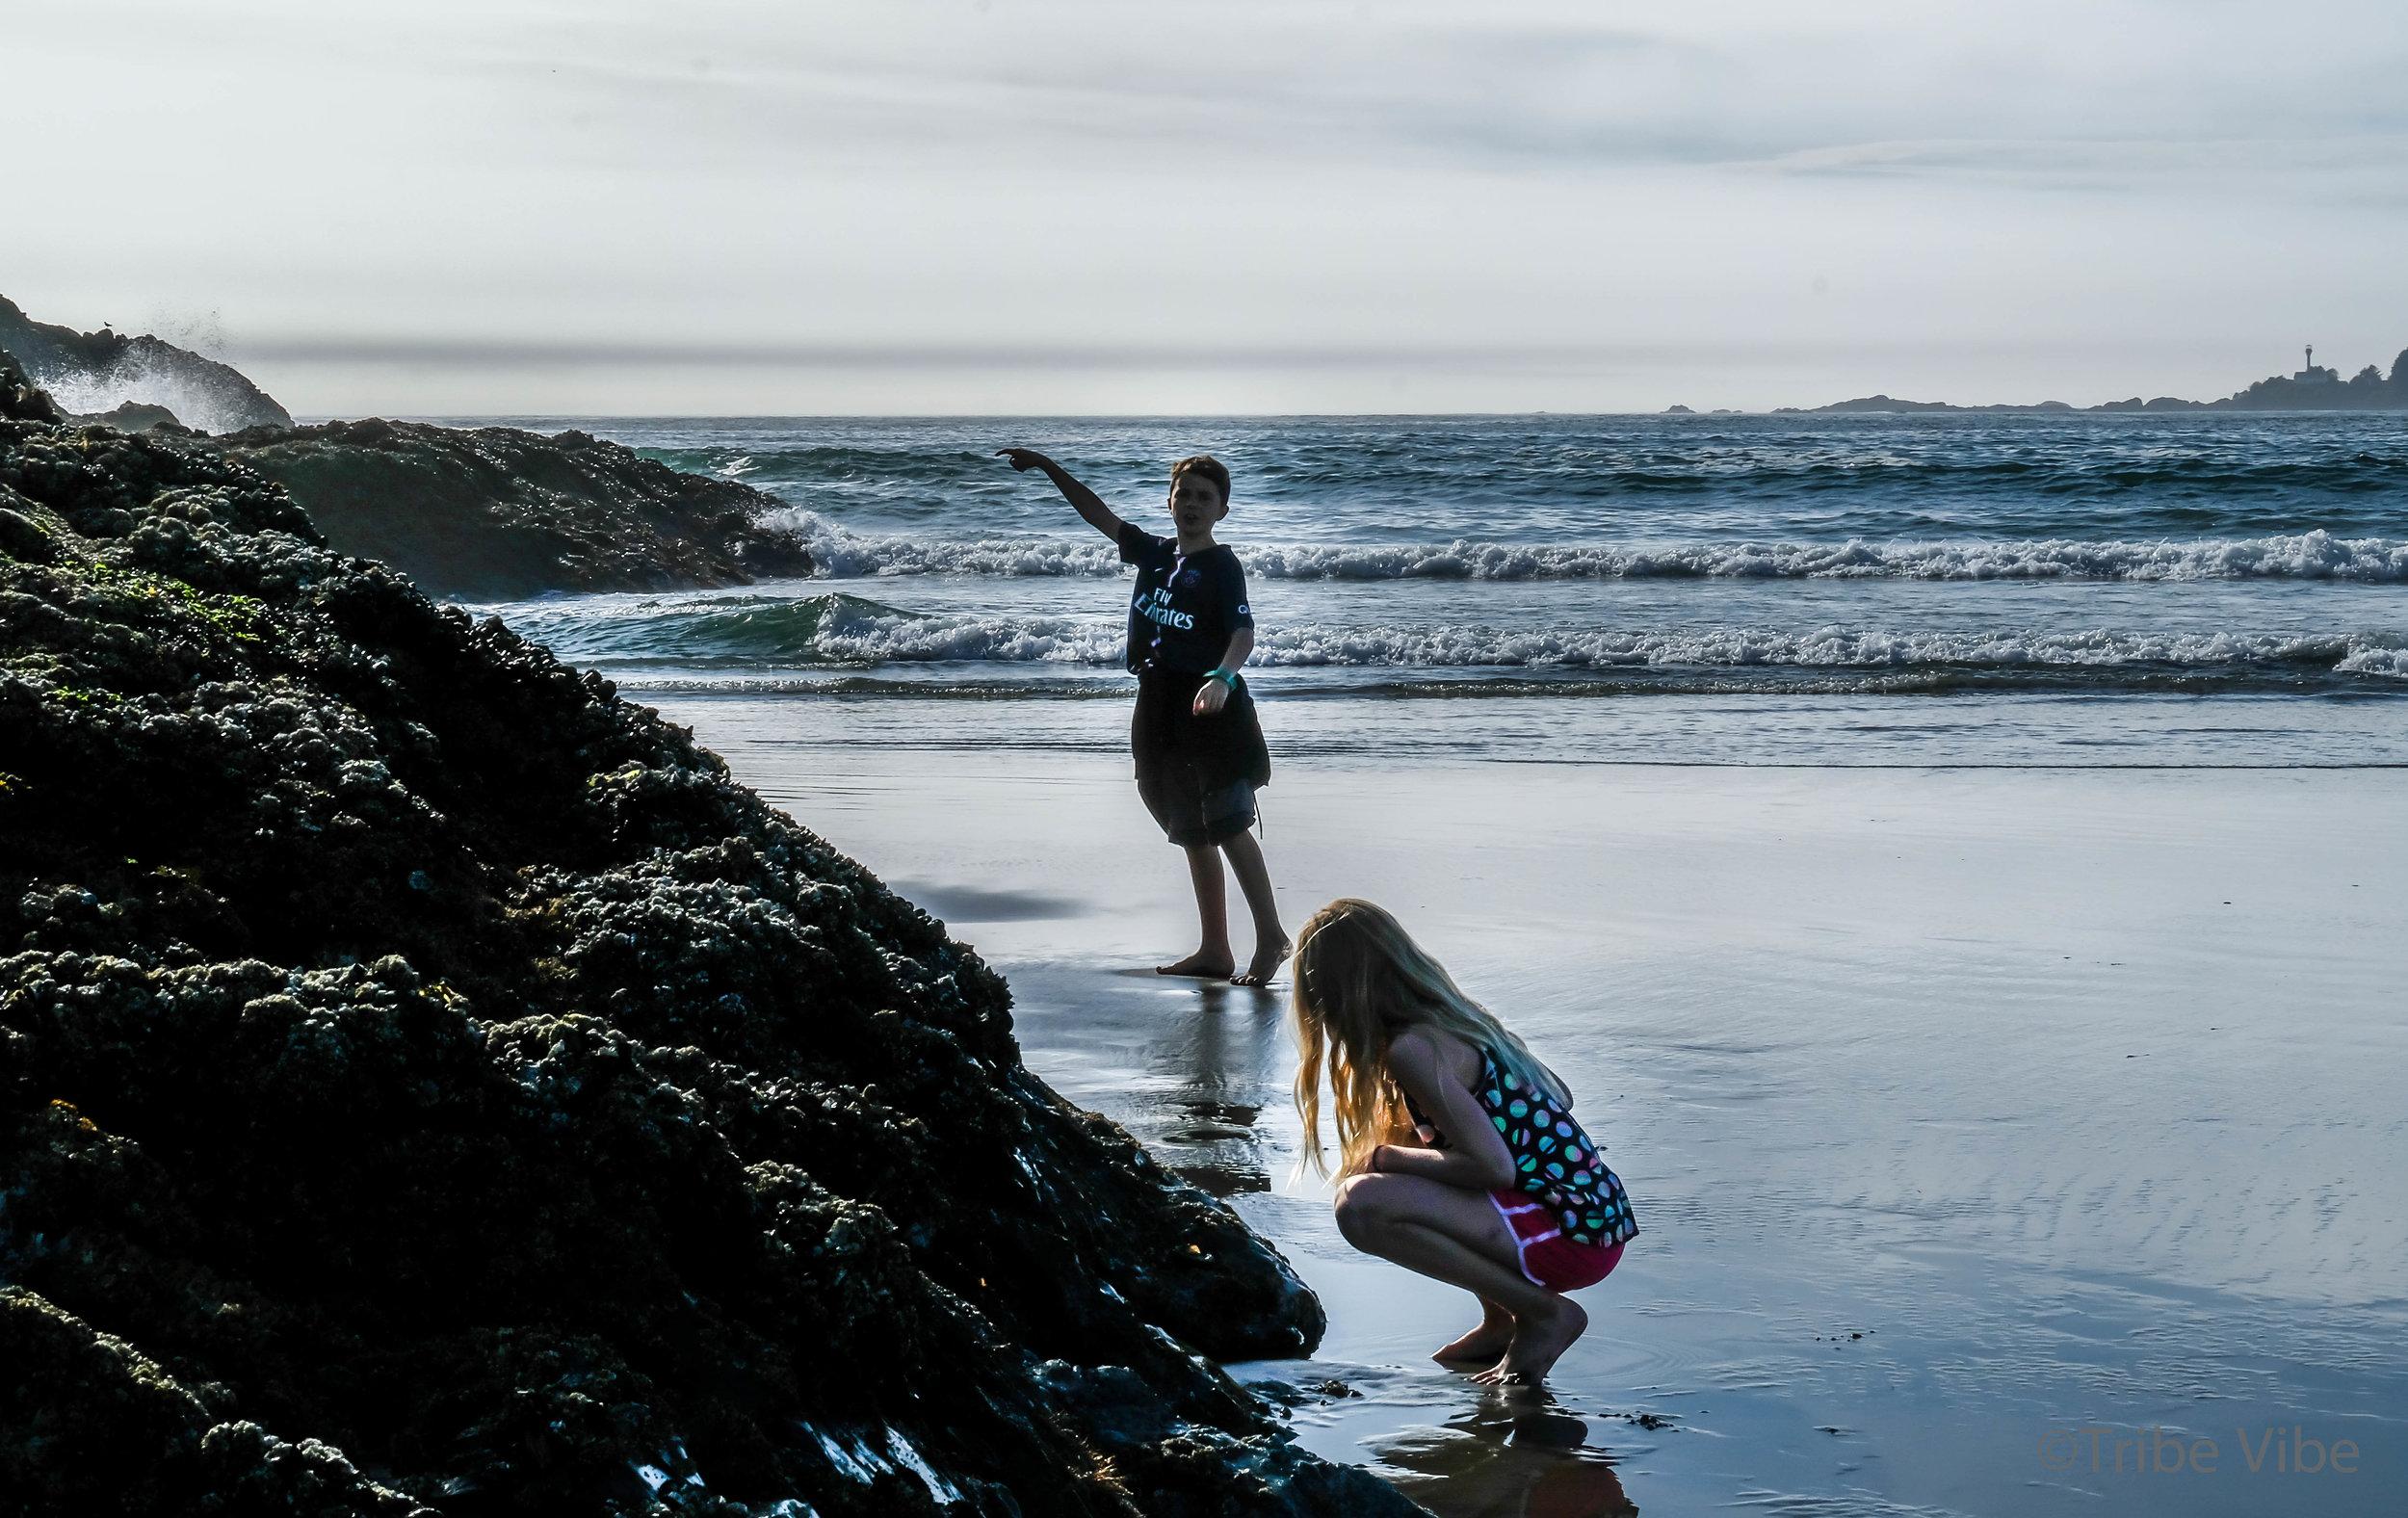 tofino surfing cox bay.53.jpg